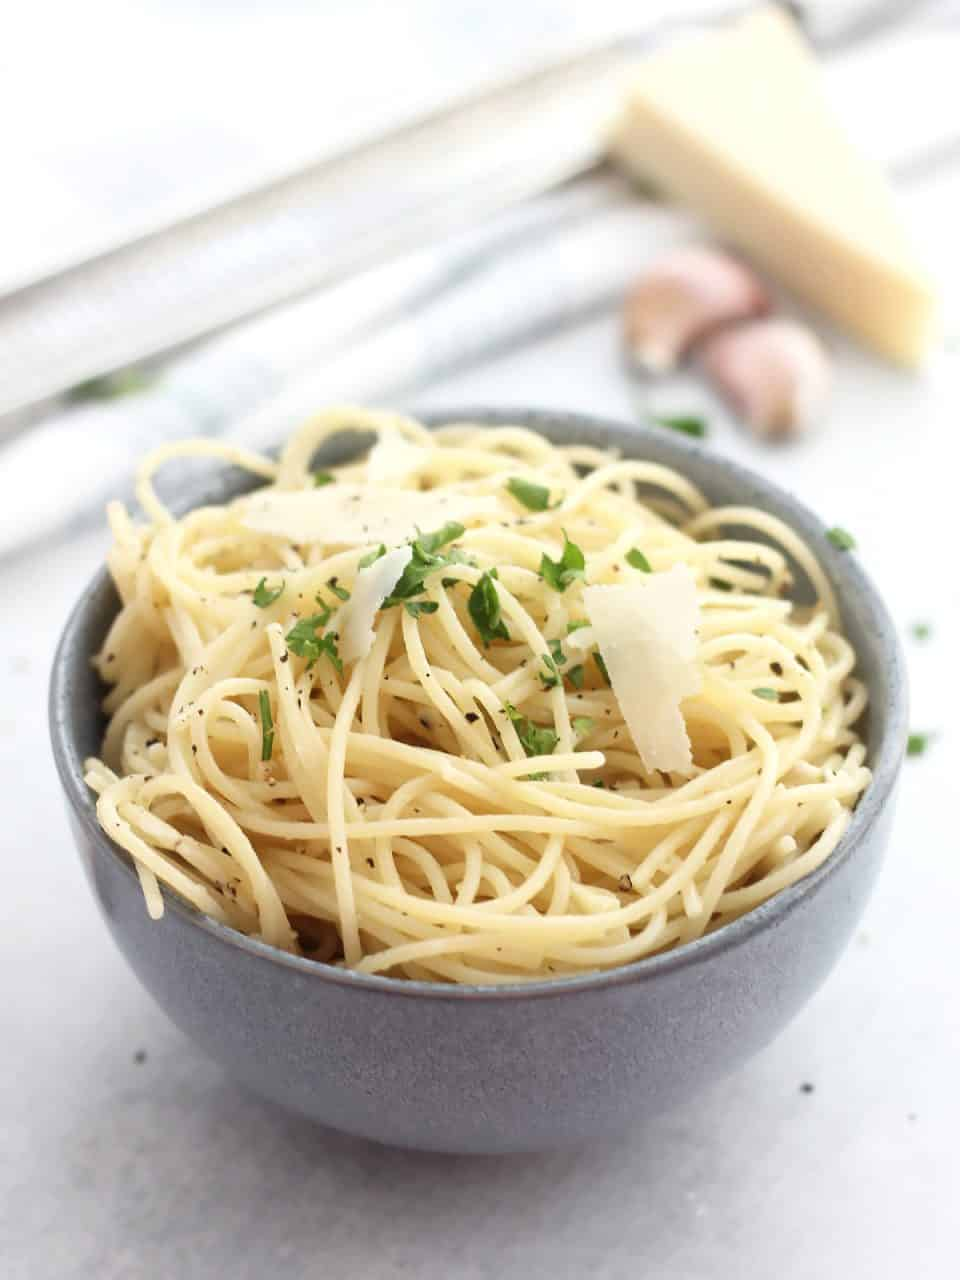 Garlic parmesan spaghetti in a blue bowl.